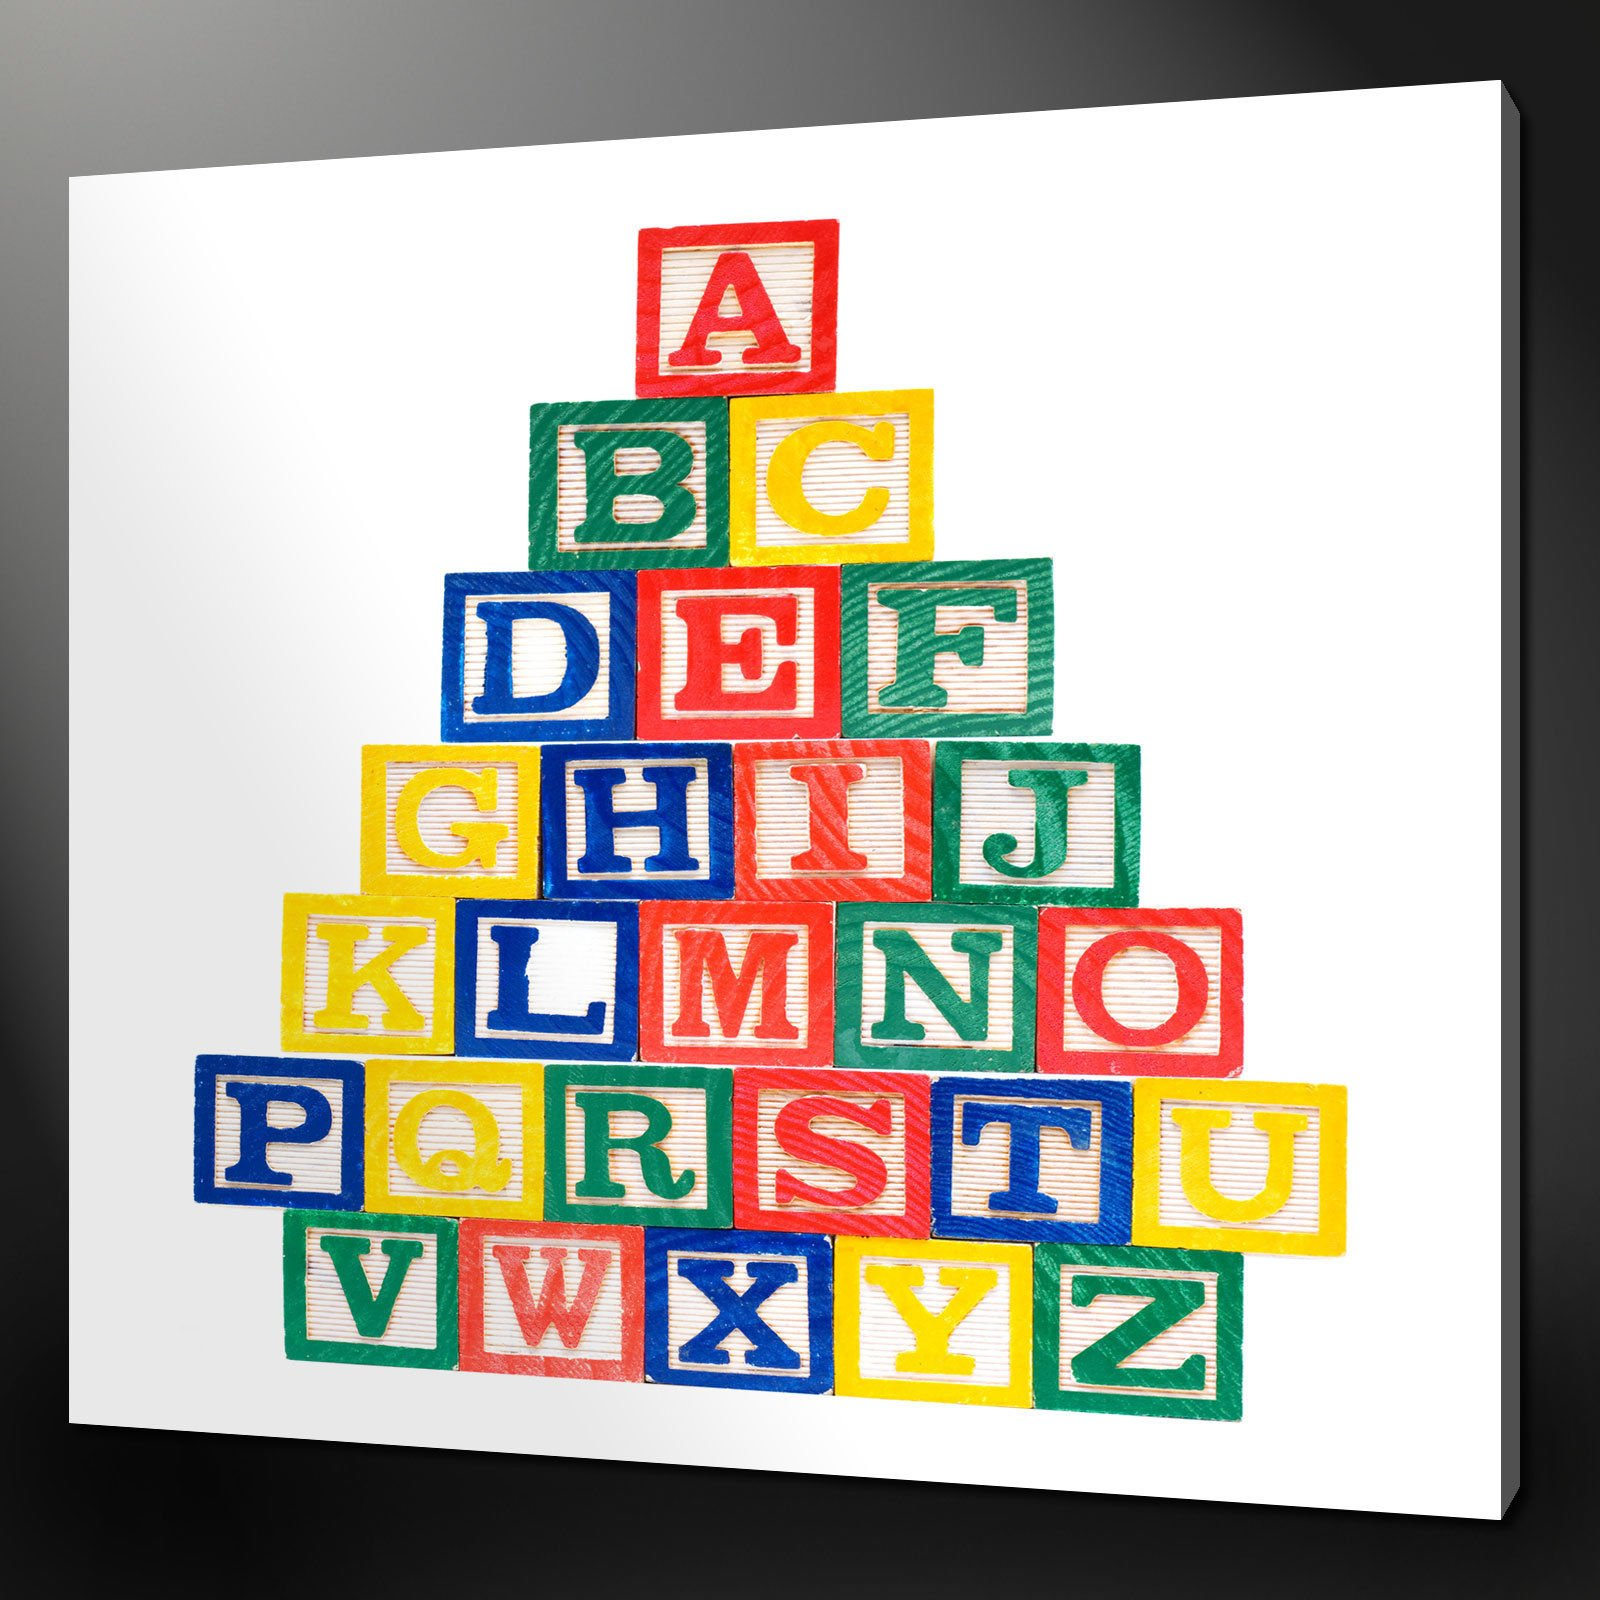 "ALPHABET BLOCKS KIDS DESIGN MODERN WALL ART CANVAS PRINT 12/""x12/"" FREE UK P/&P"